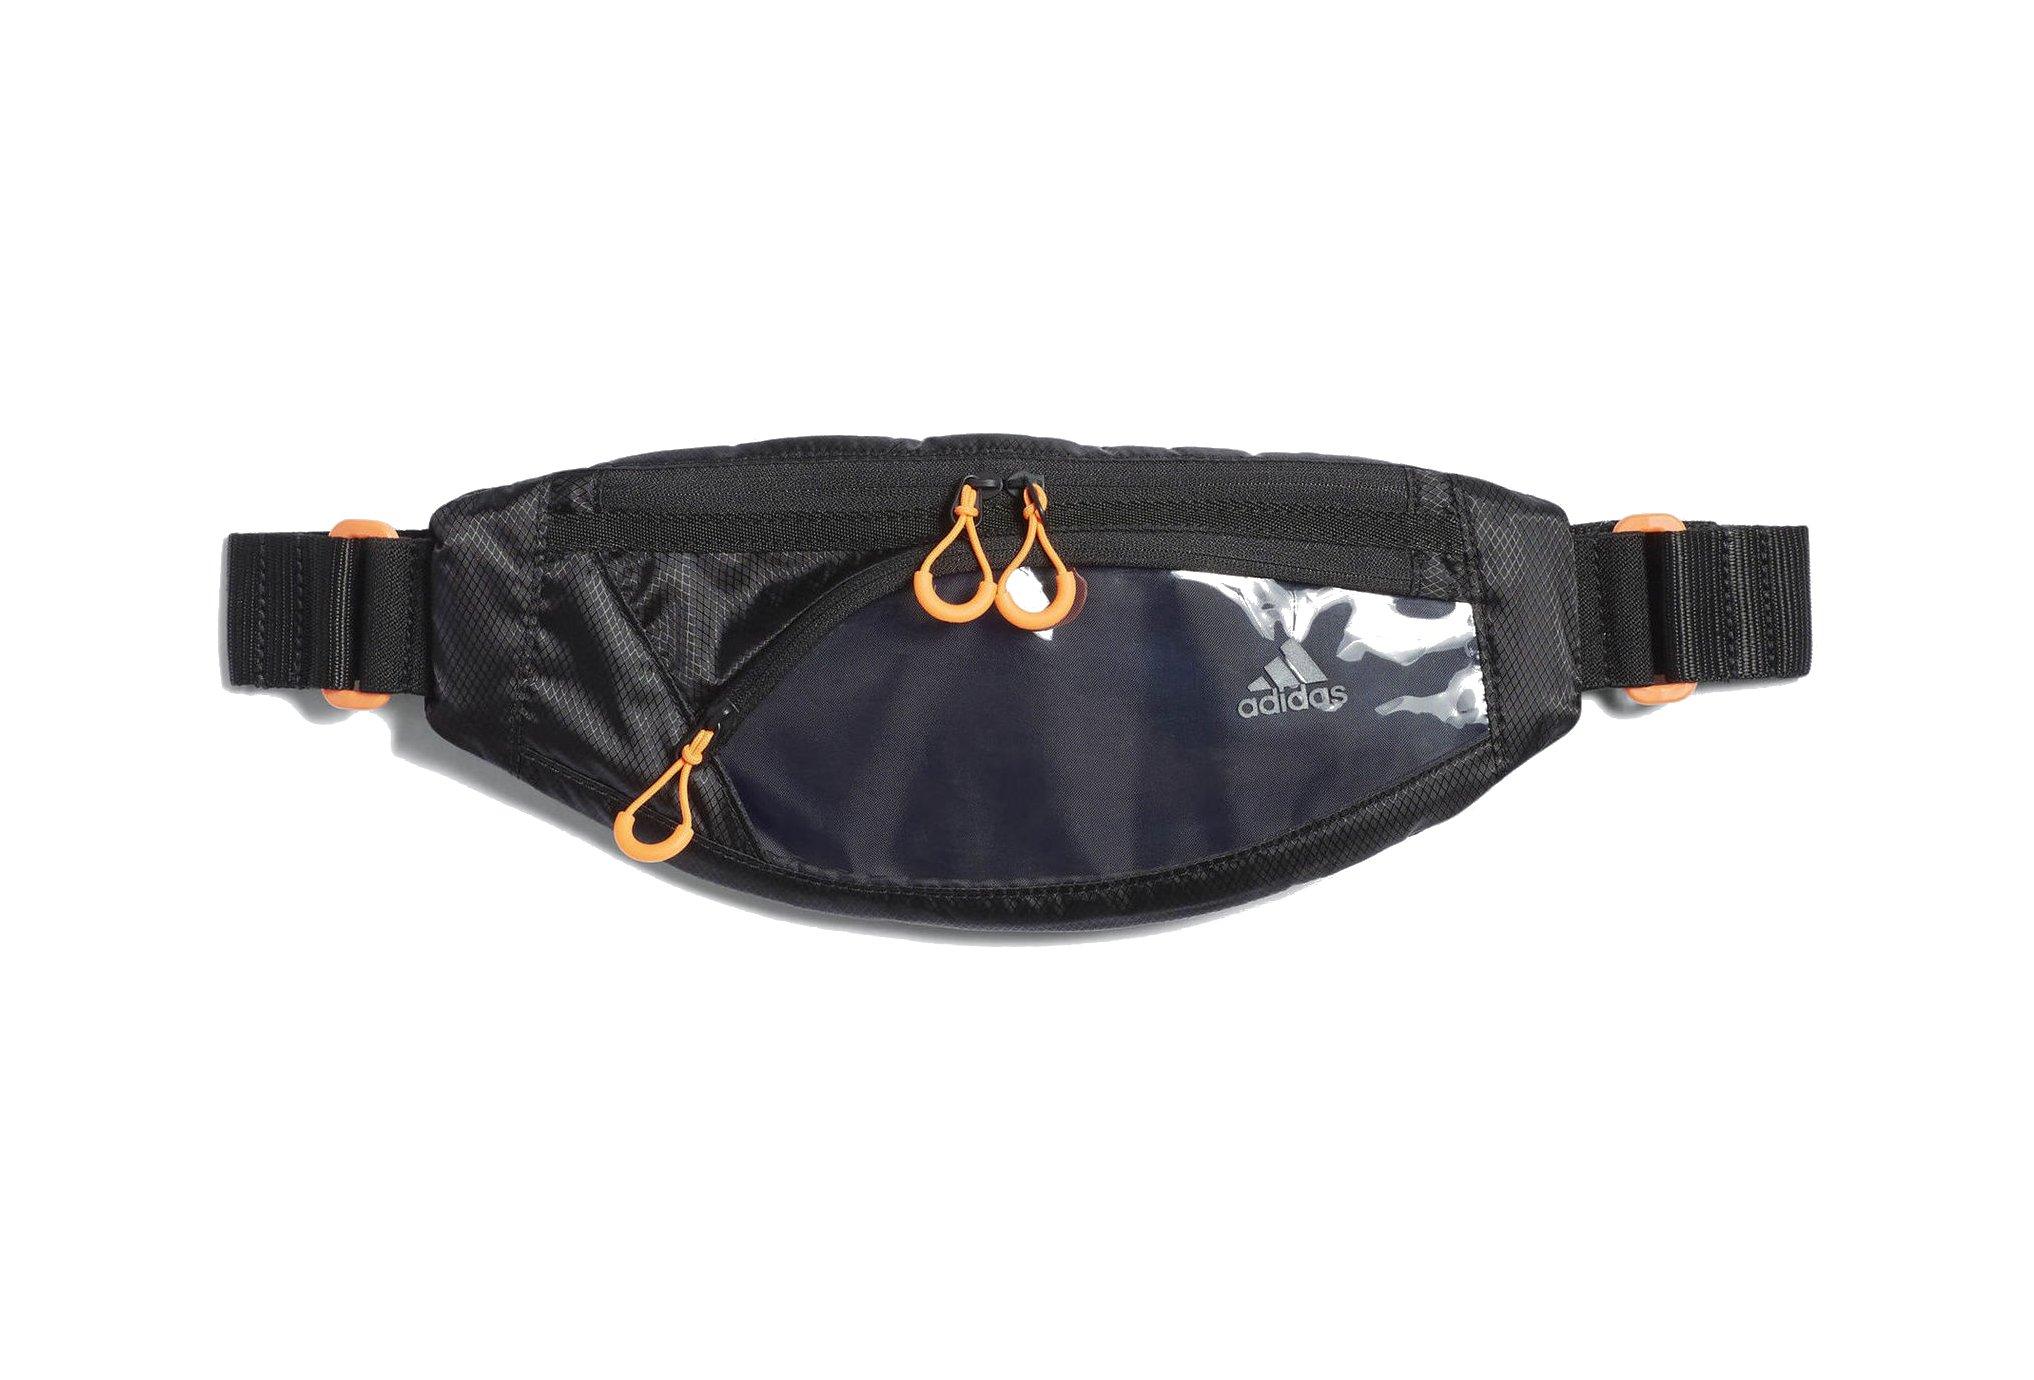 Adidas Waist bag ceinture / porte dossard